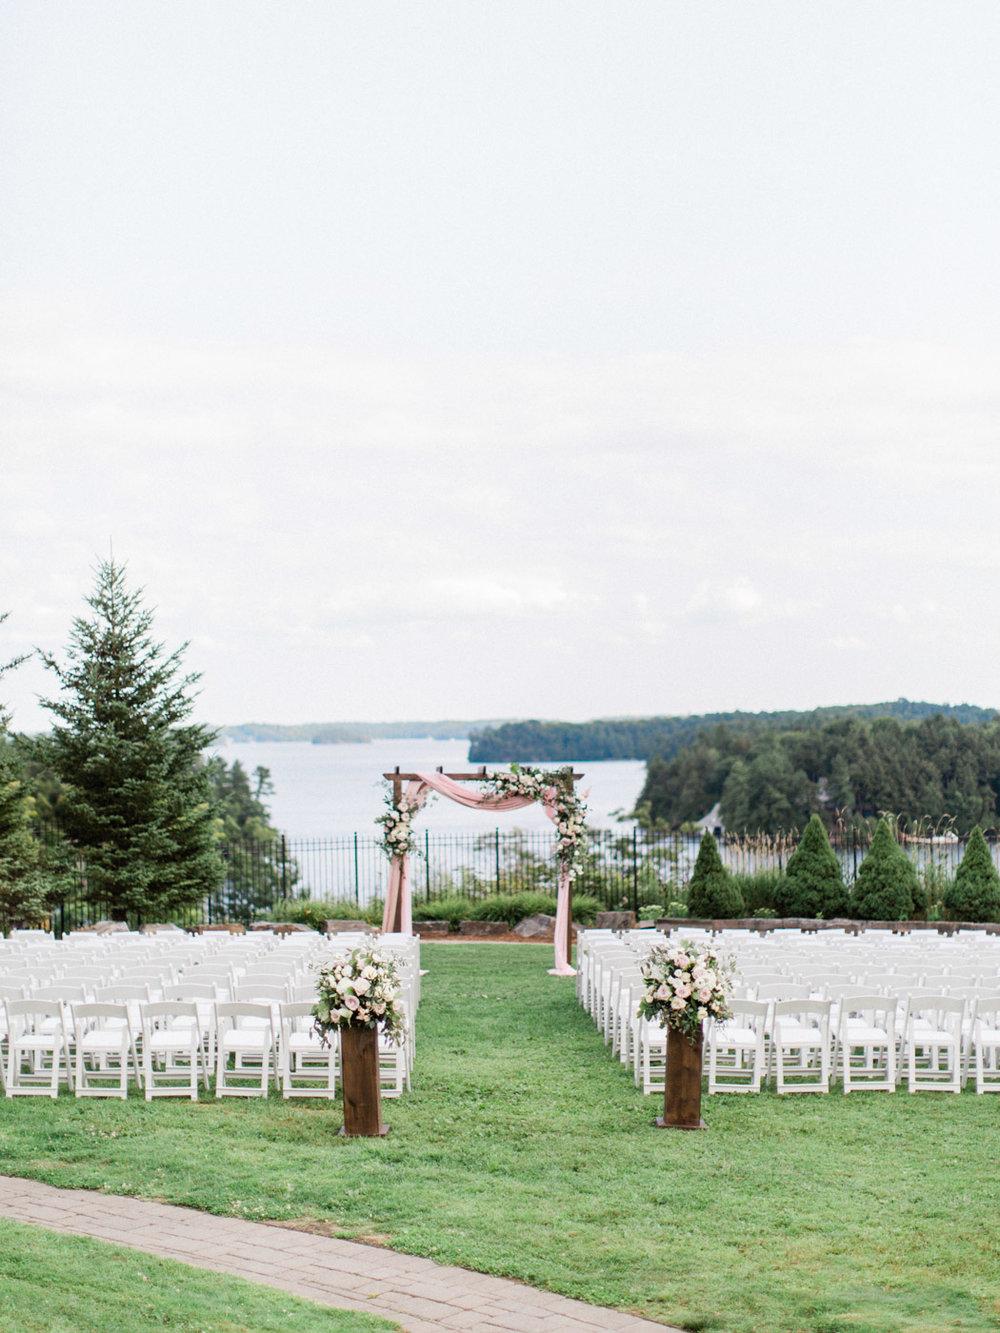 Toronto-Muskoka-wedding-photographer-summery-fun-documentary-the-marriott-rosseau65.jpg